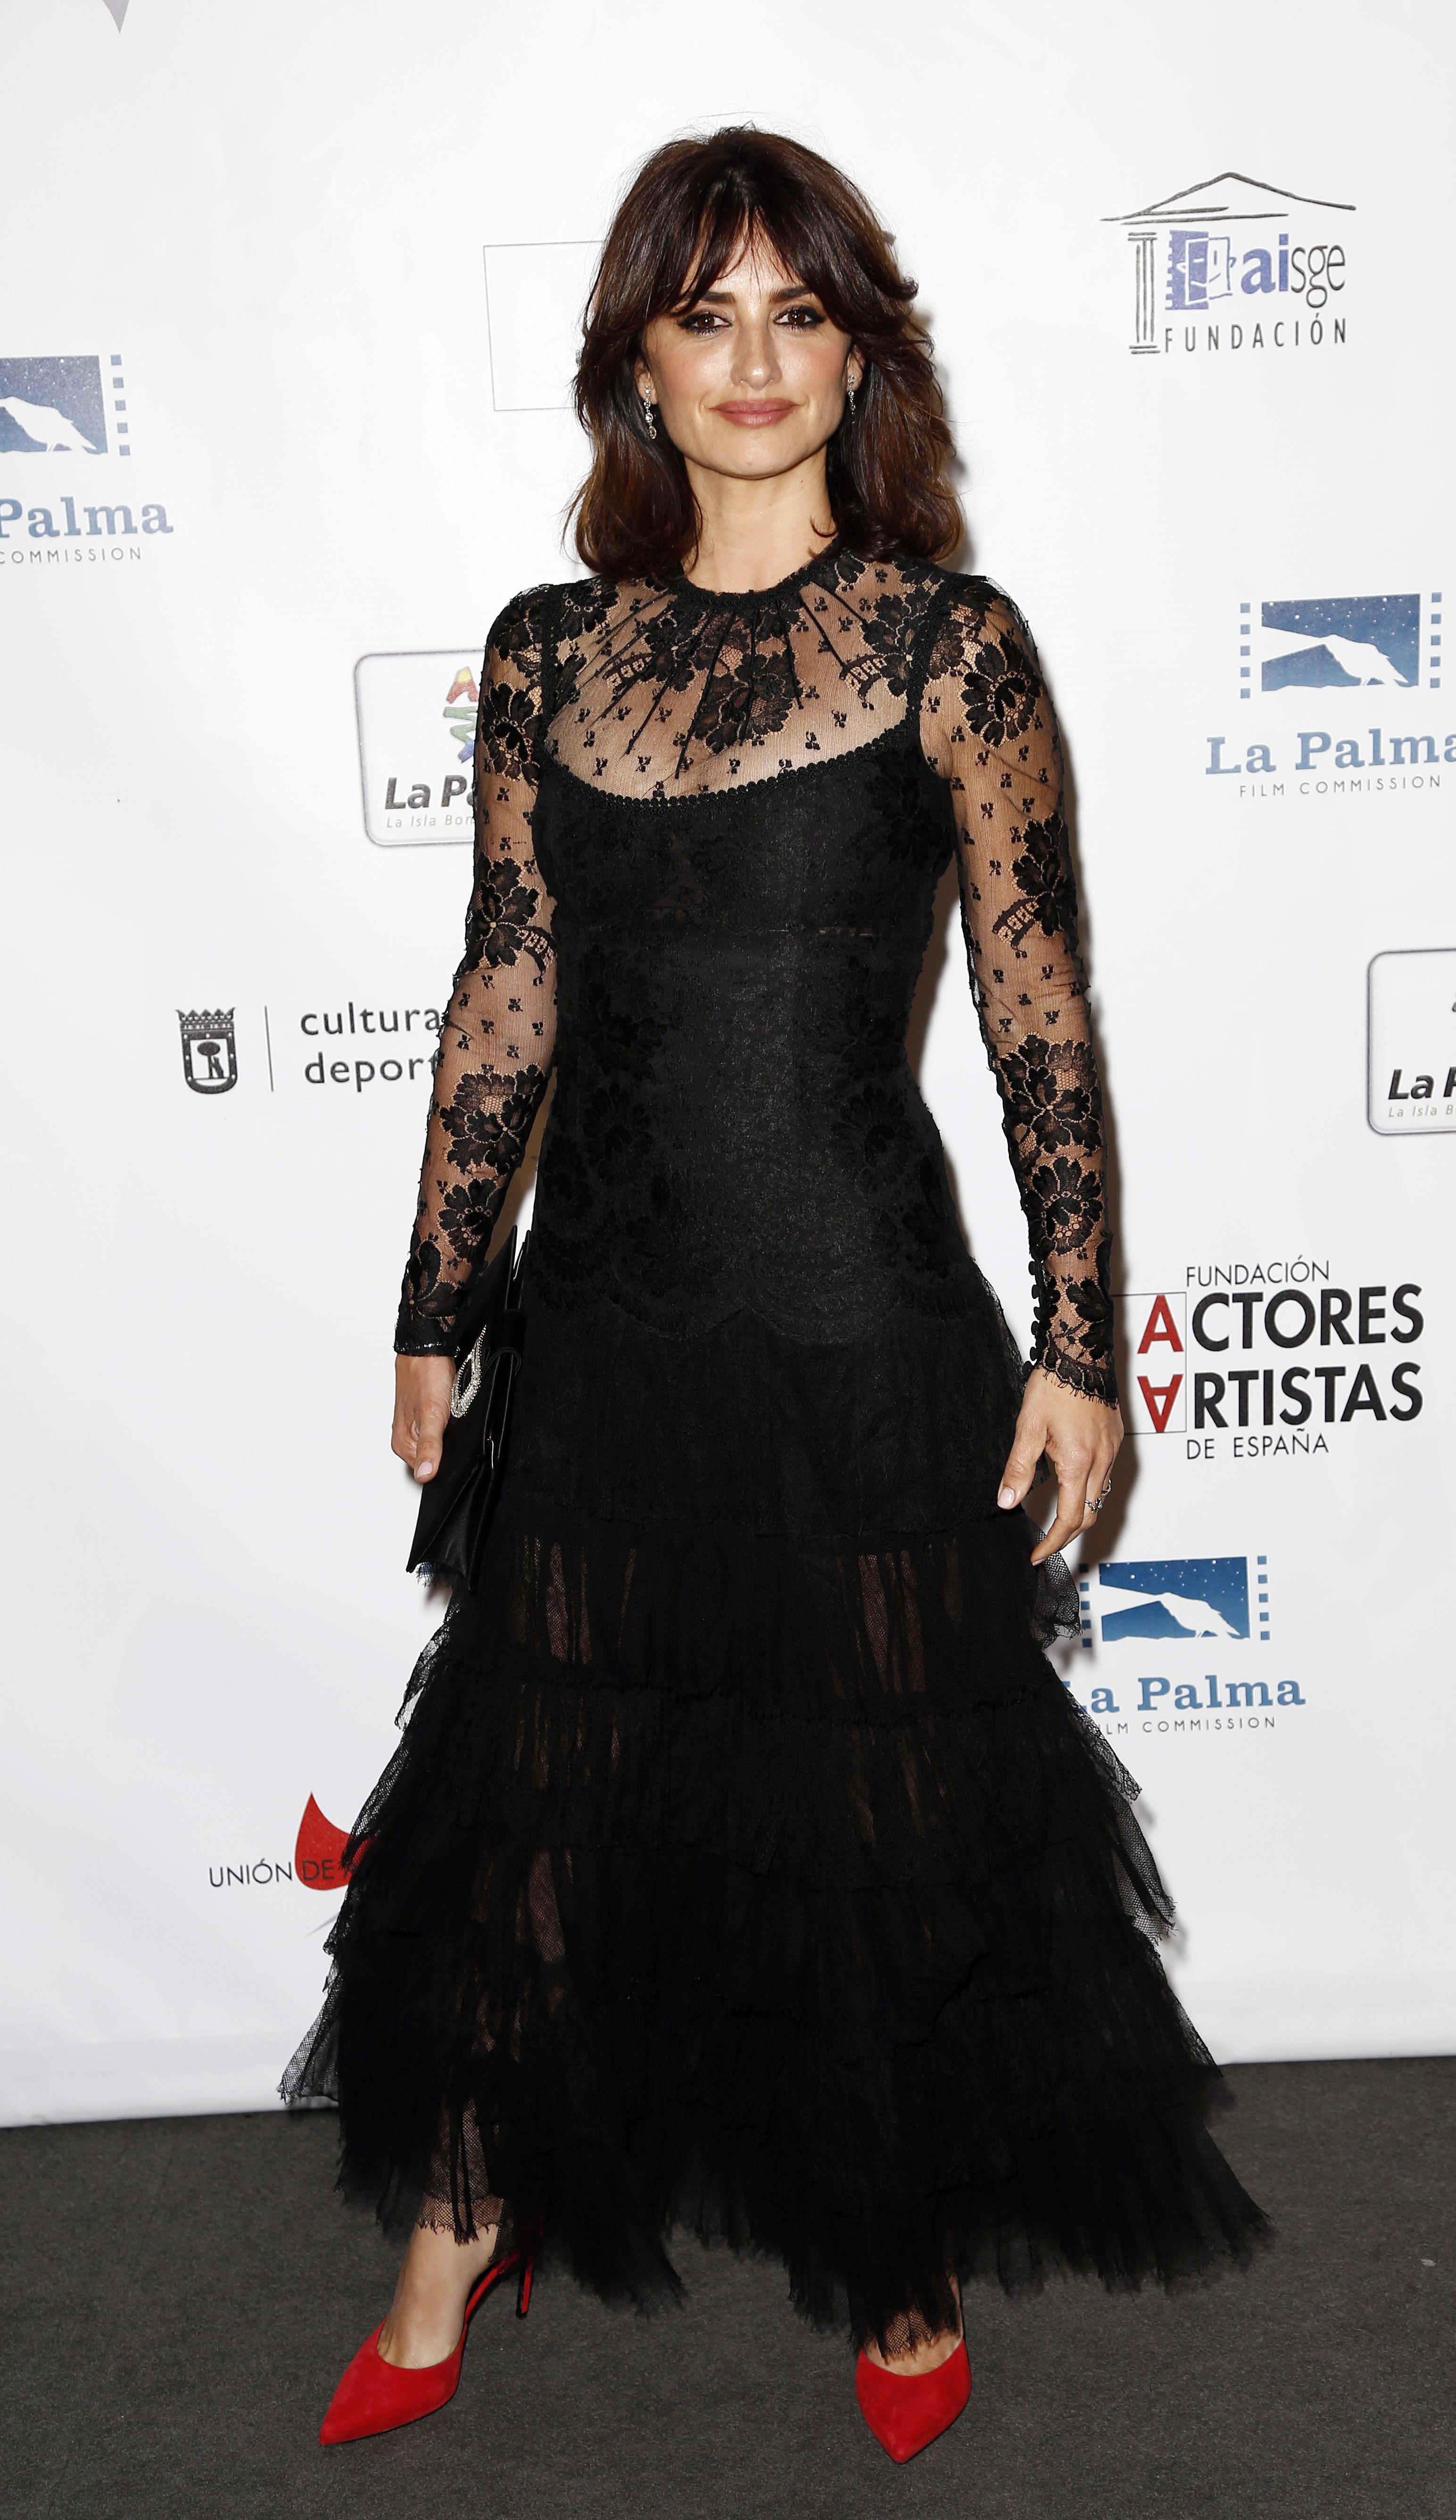 XXVI Union De Actores Awards In Madrid